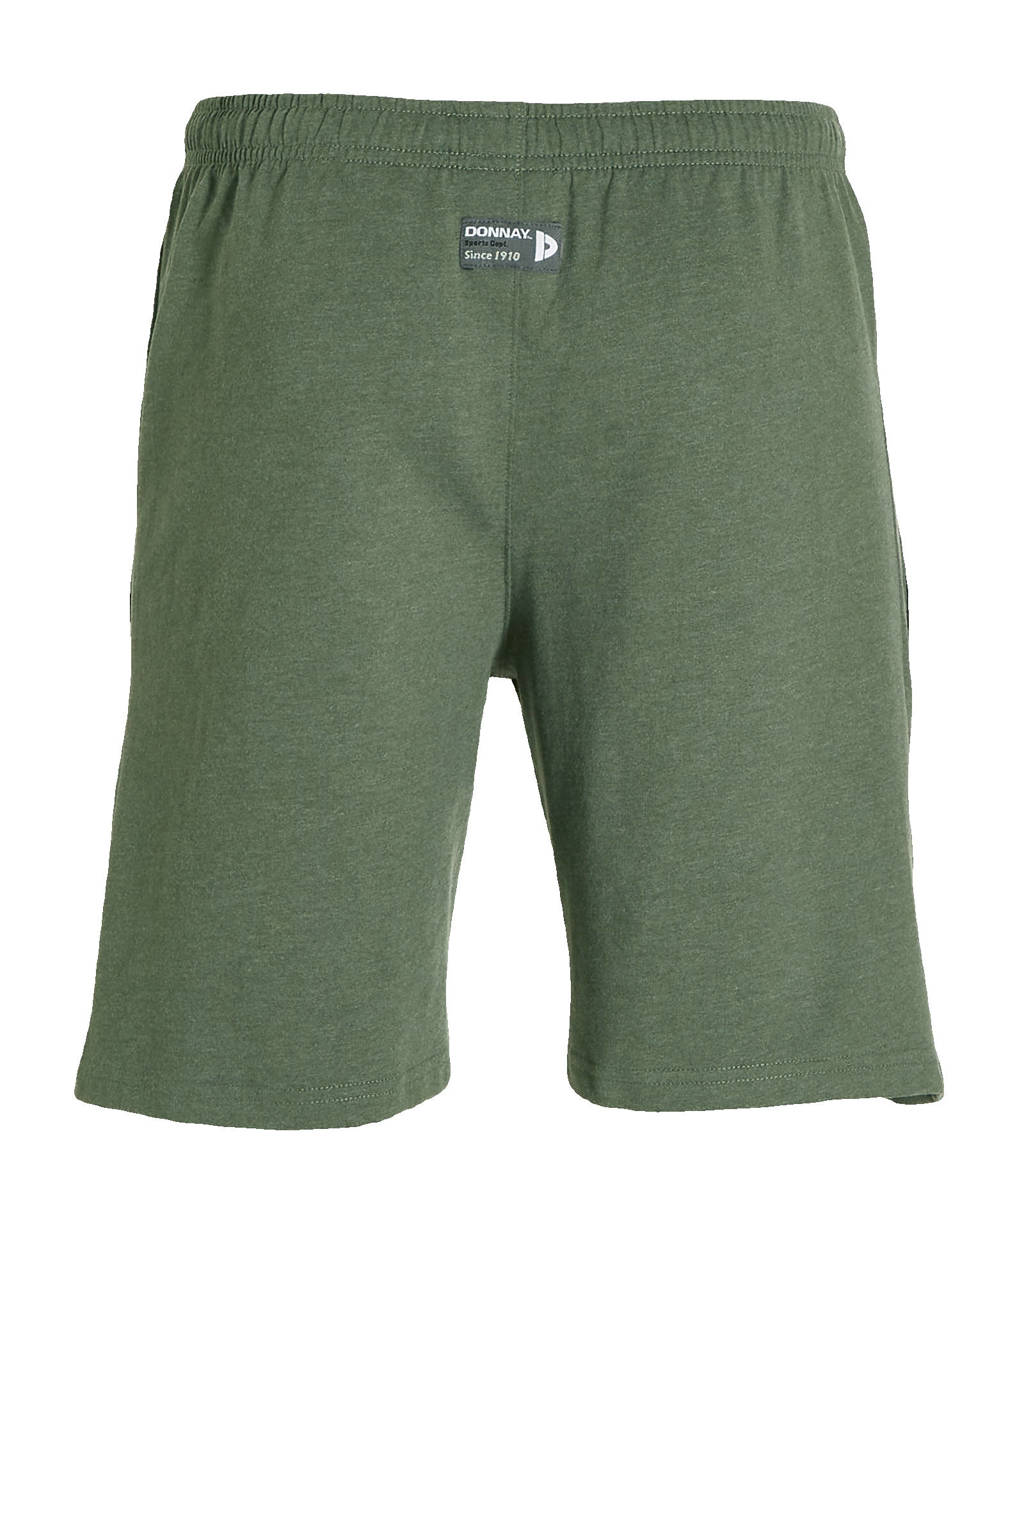 Donnay   sportshort groen, Groen